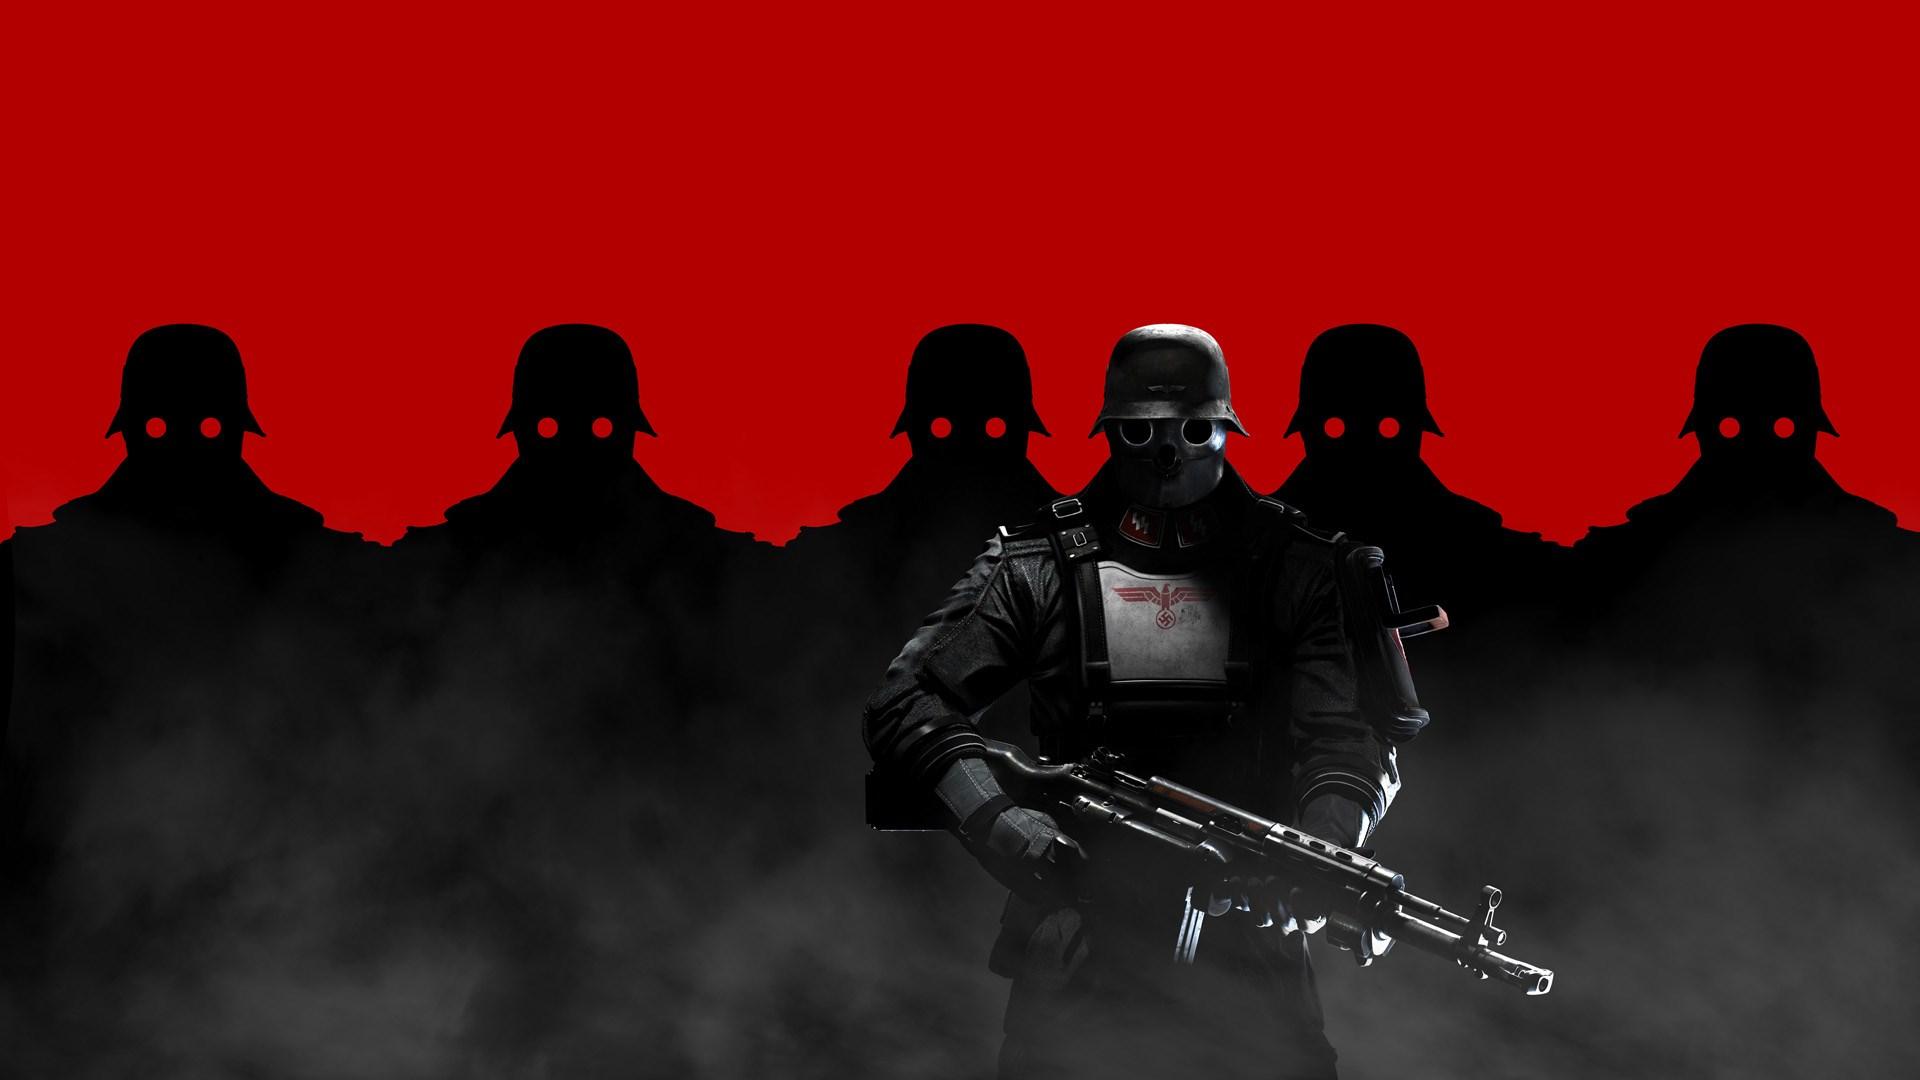 Wolfenstein The New Order Game Wallpaper Free Download